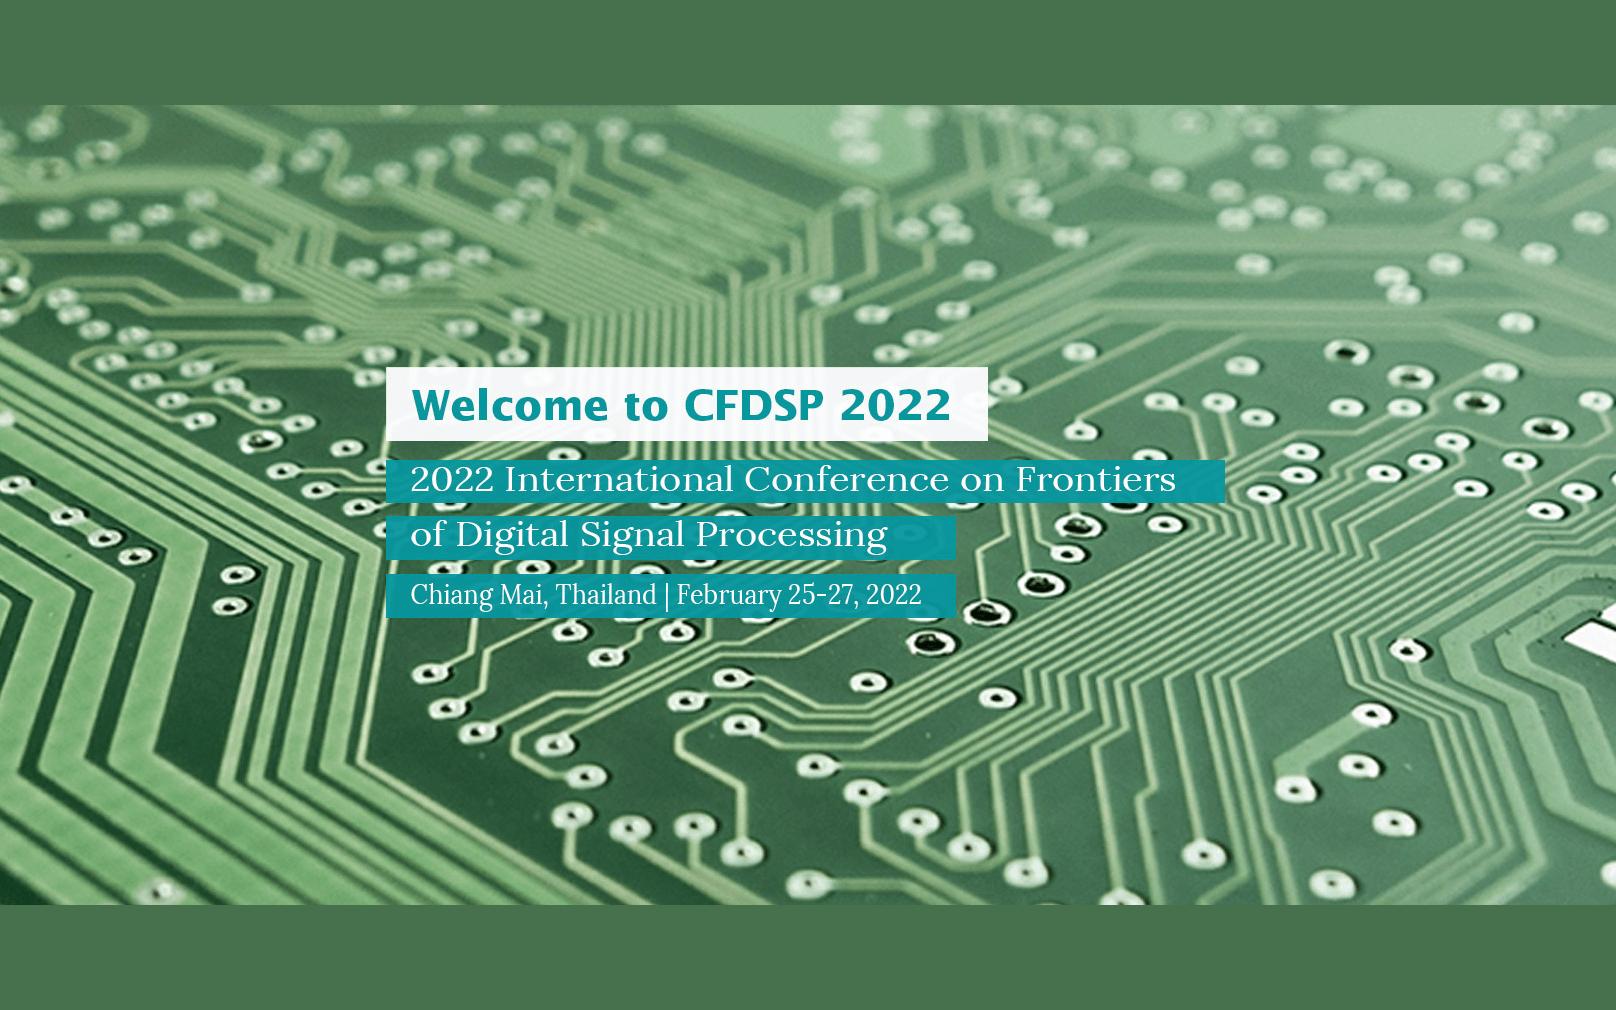 【EI检索】 2022年数字信号处理前沿国际会议(CFDSP 2022)